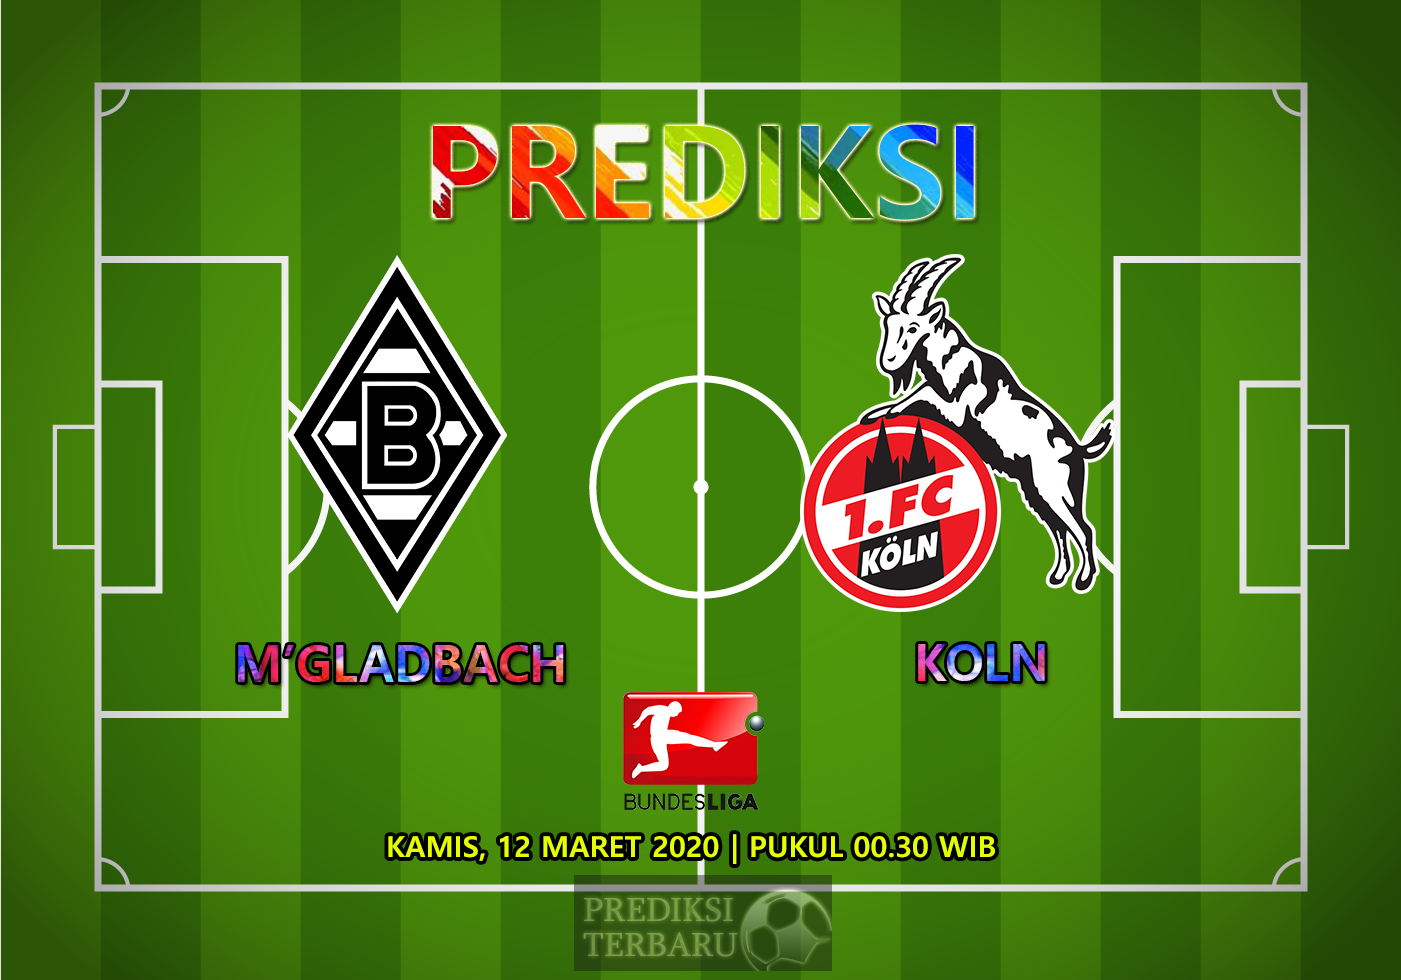 Prediksi Borussia M'gladbach Vs Koln Kamis 12 Maret